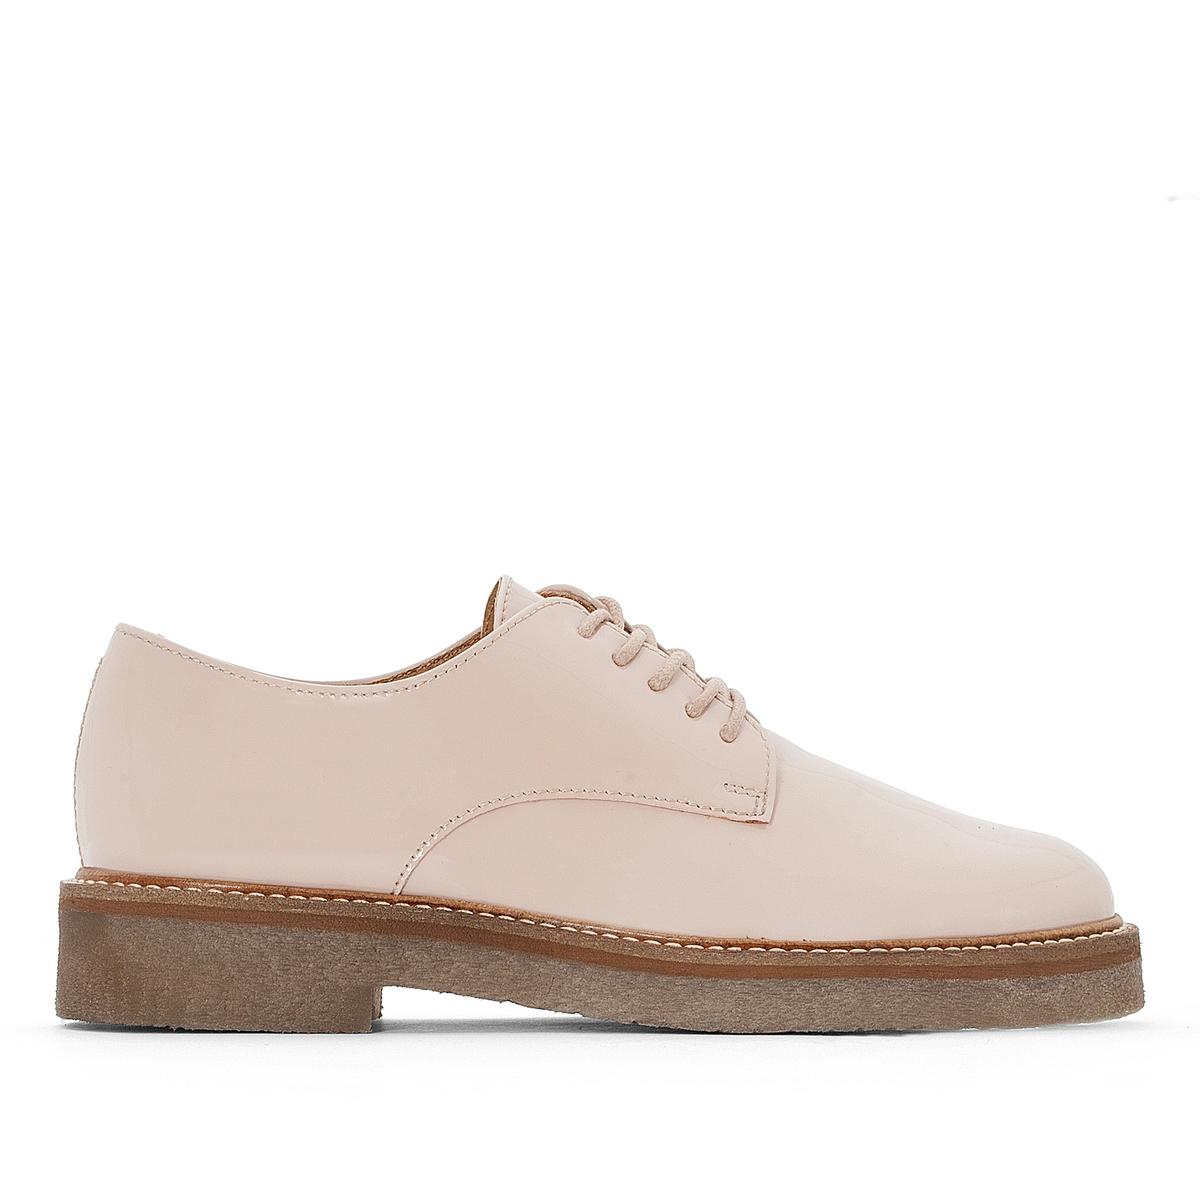 Ботинки-дерби OXFORK ботинки дерби под кожу питона